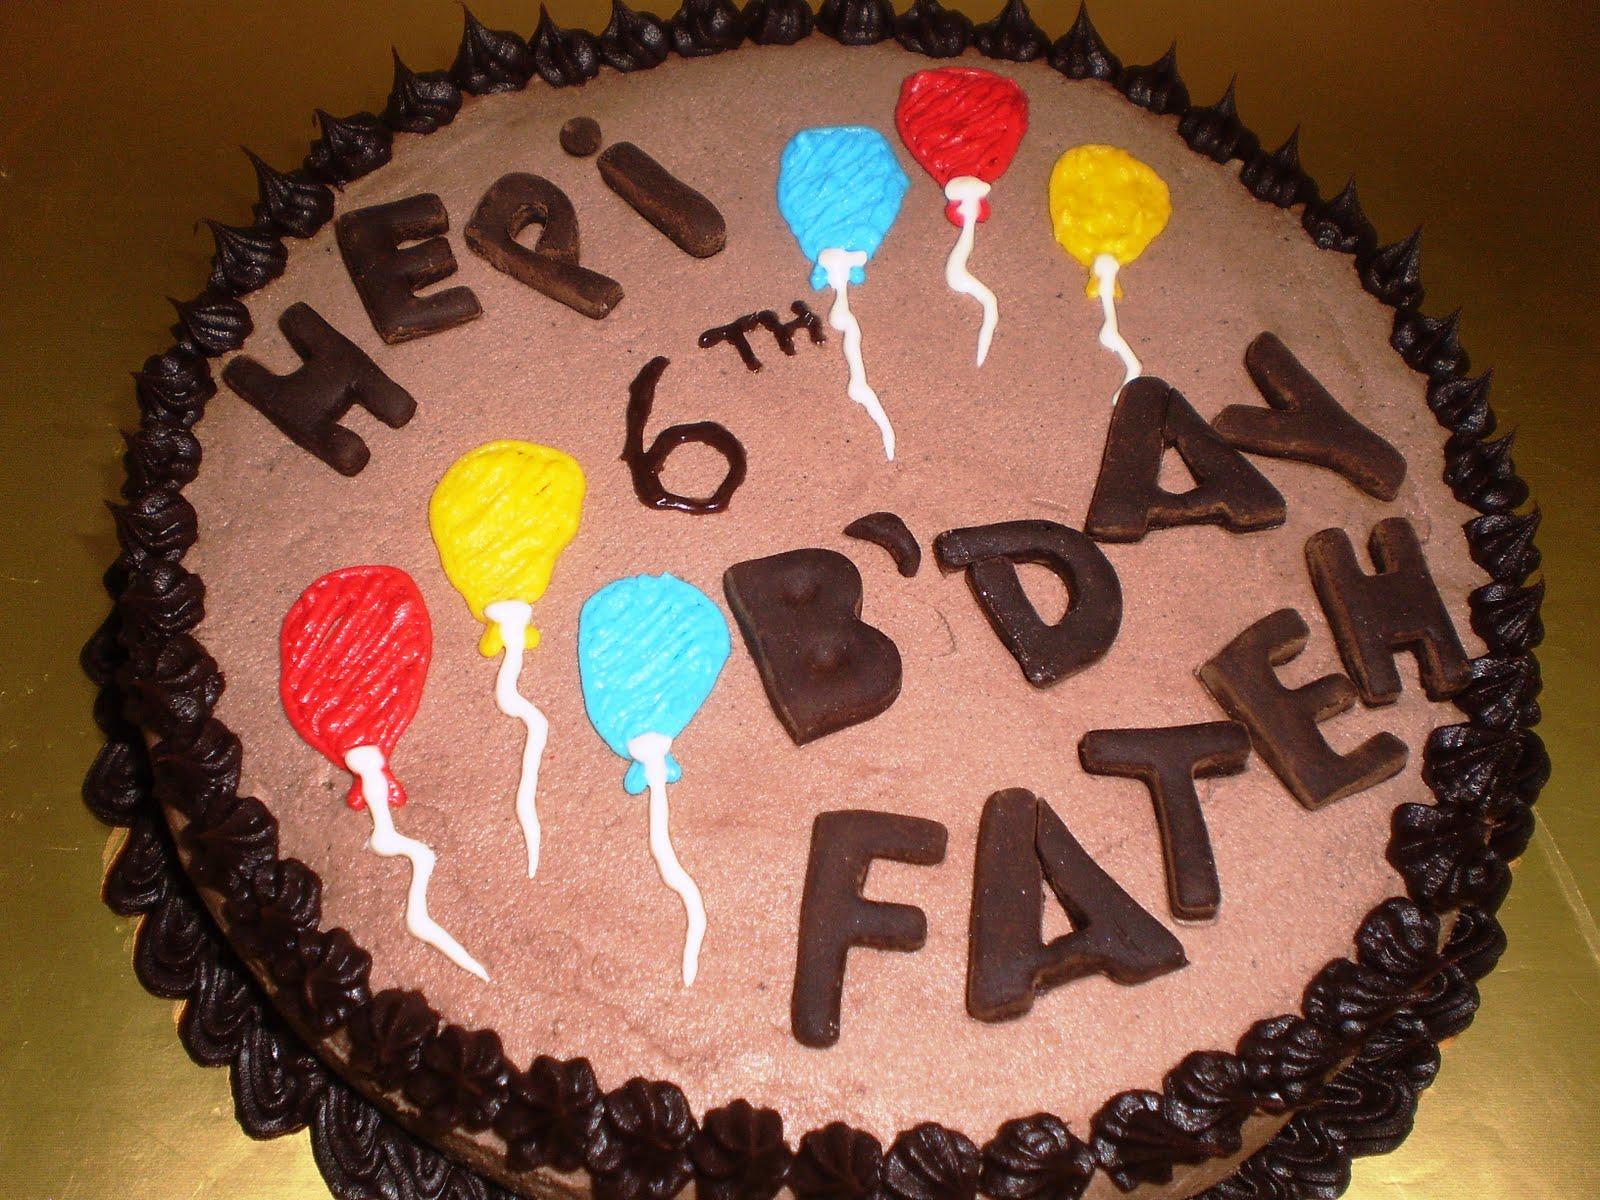 Sweetheart Cake And Cookies Ultraman Cupcakes N Choc Cake